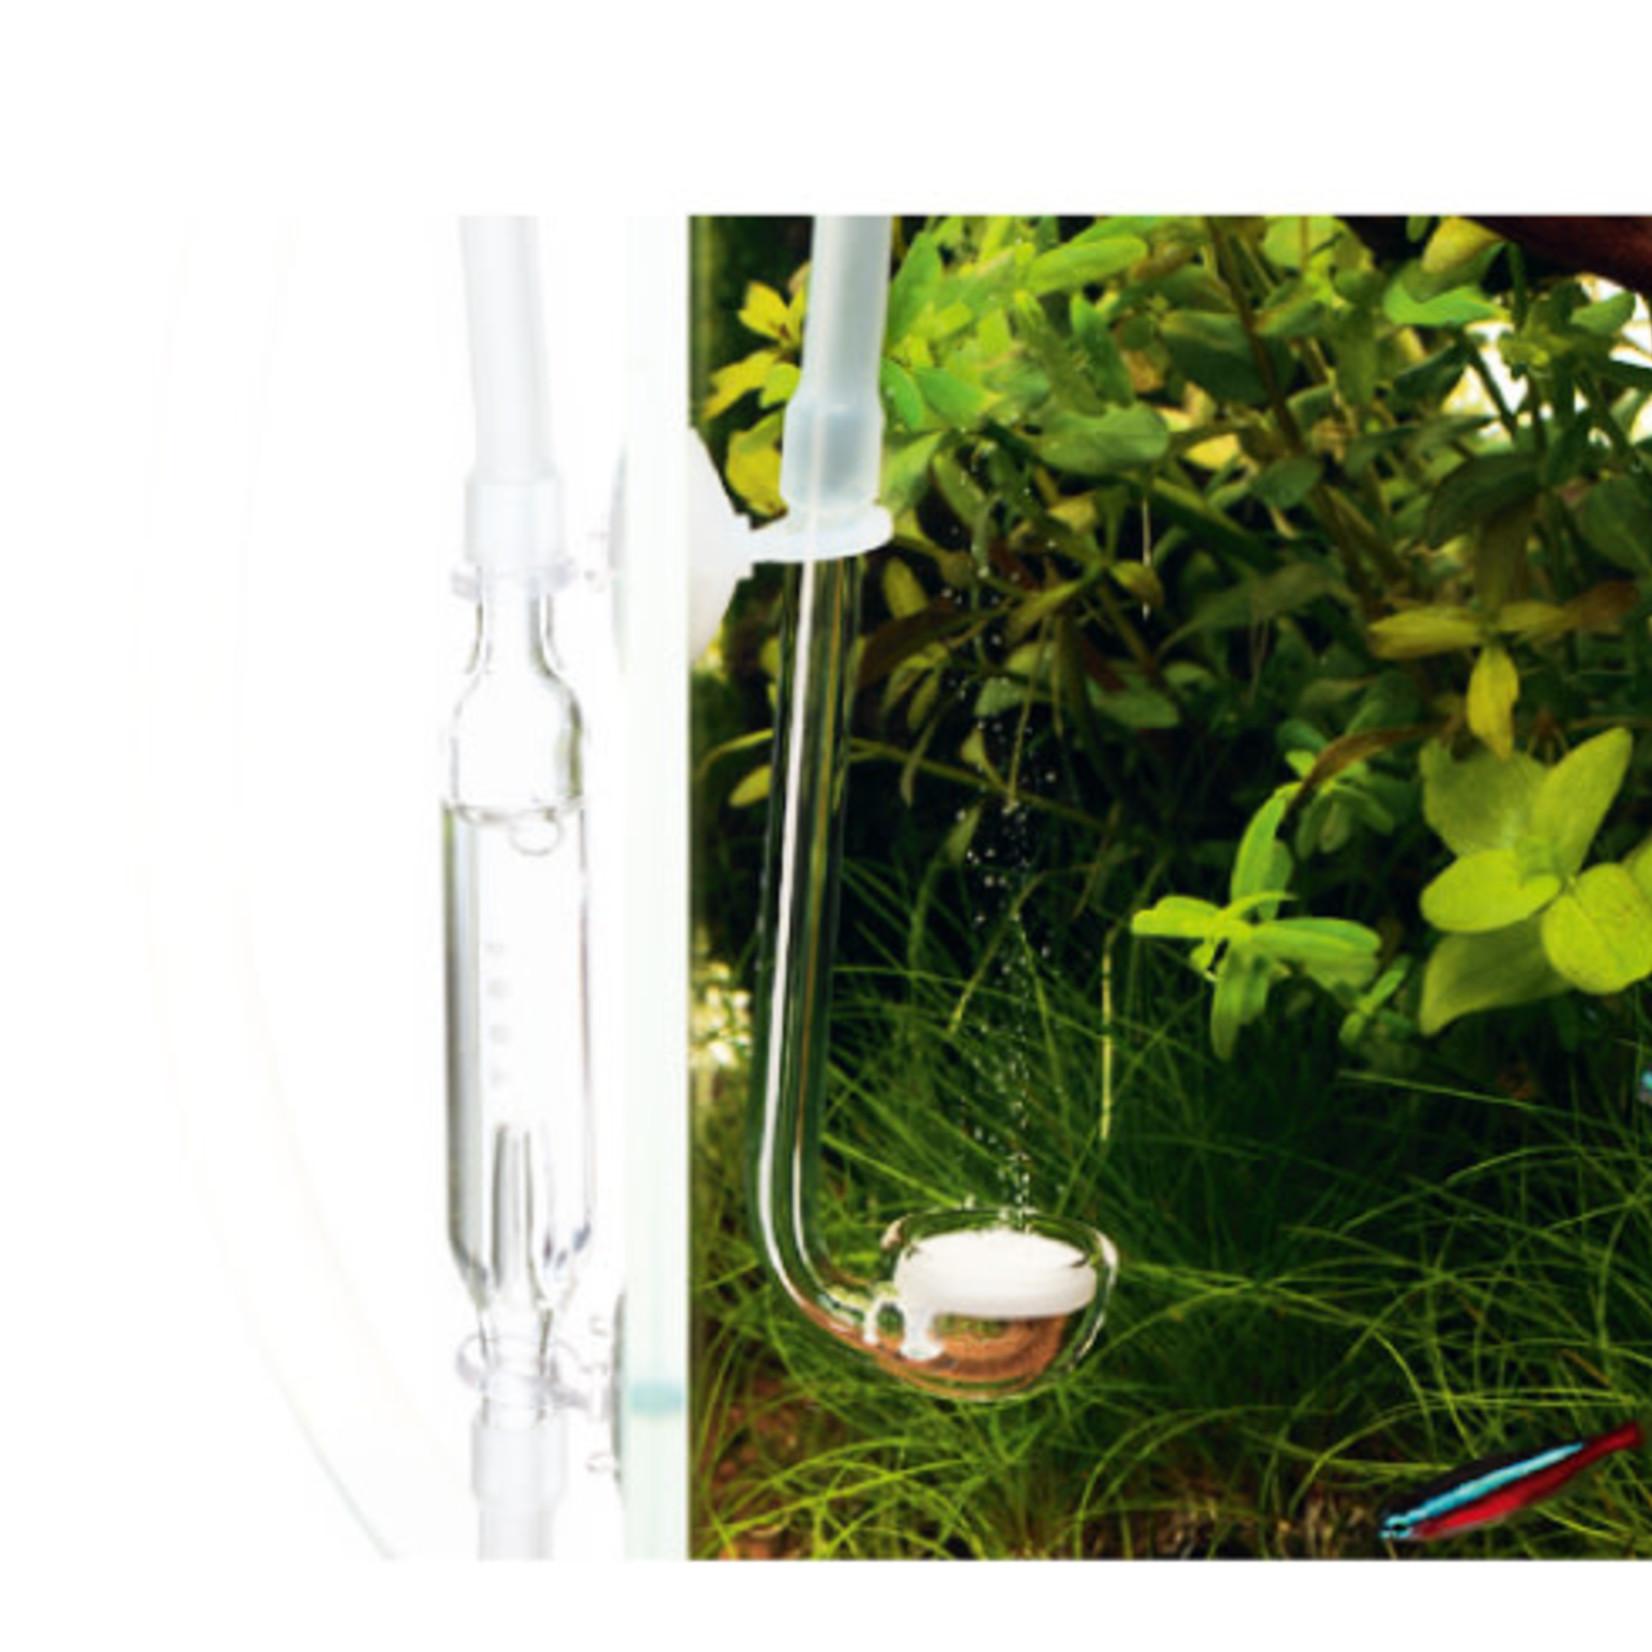 DOOA CO2 Mini-diffusor